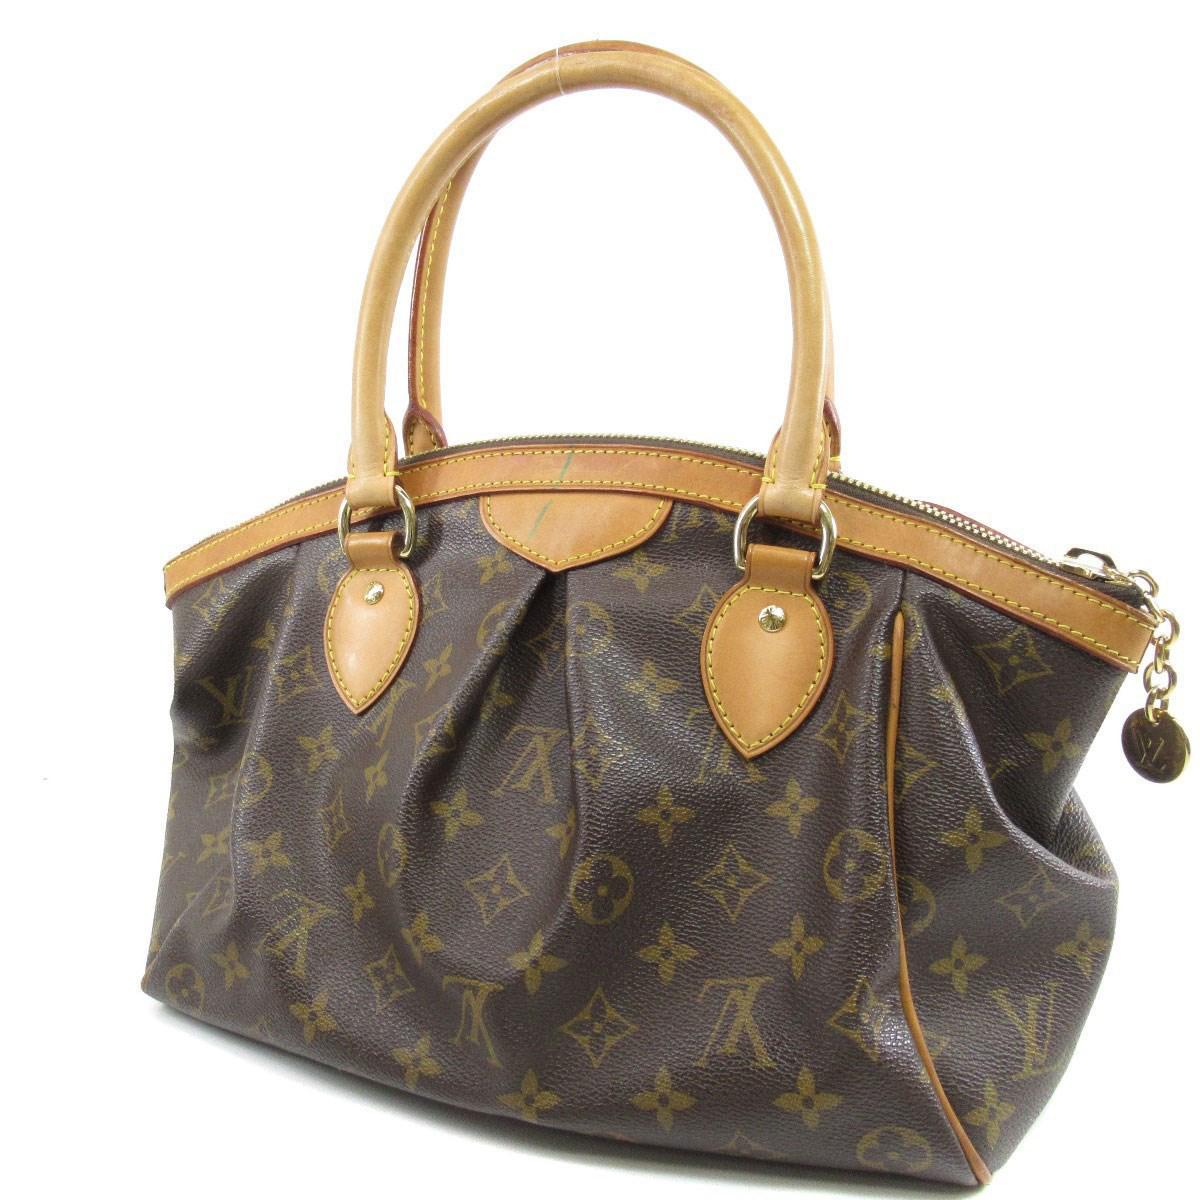 ff0ccbefff4e Lyst - Louis Vuitton Monogram Canvas Handbag M40143 Tivoli Pm in Brown